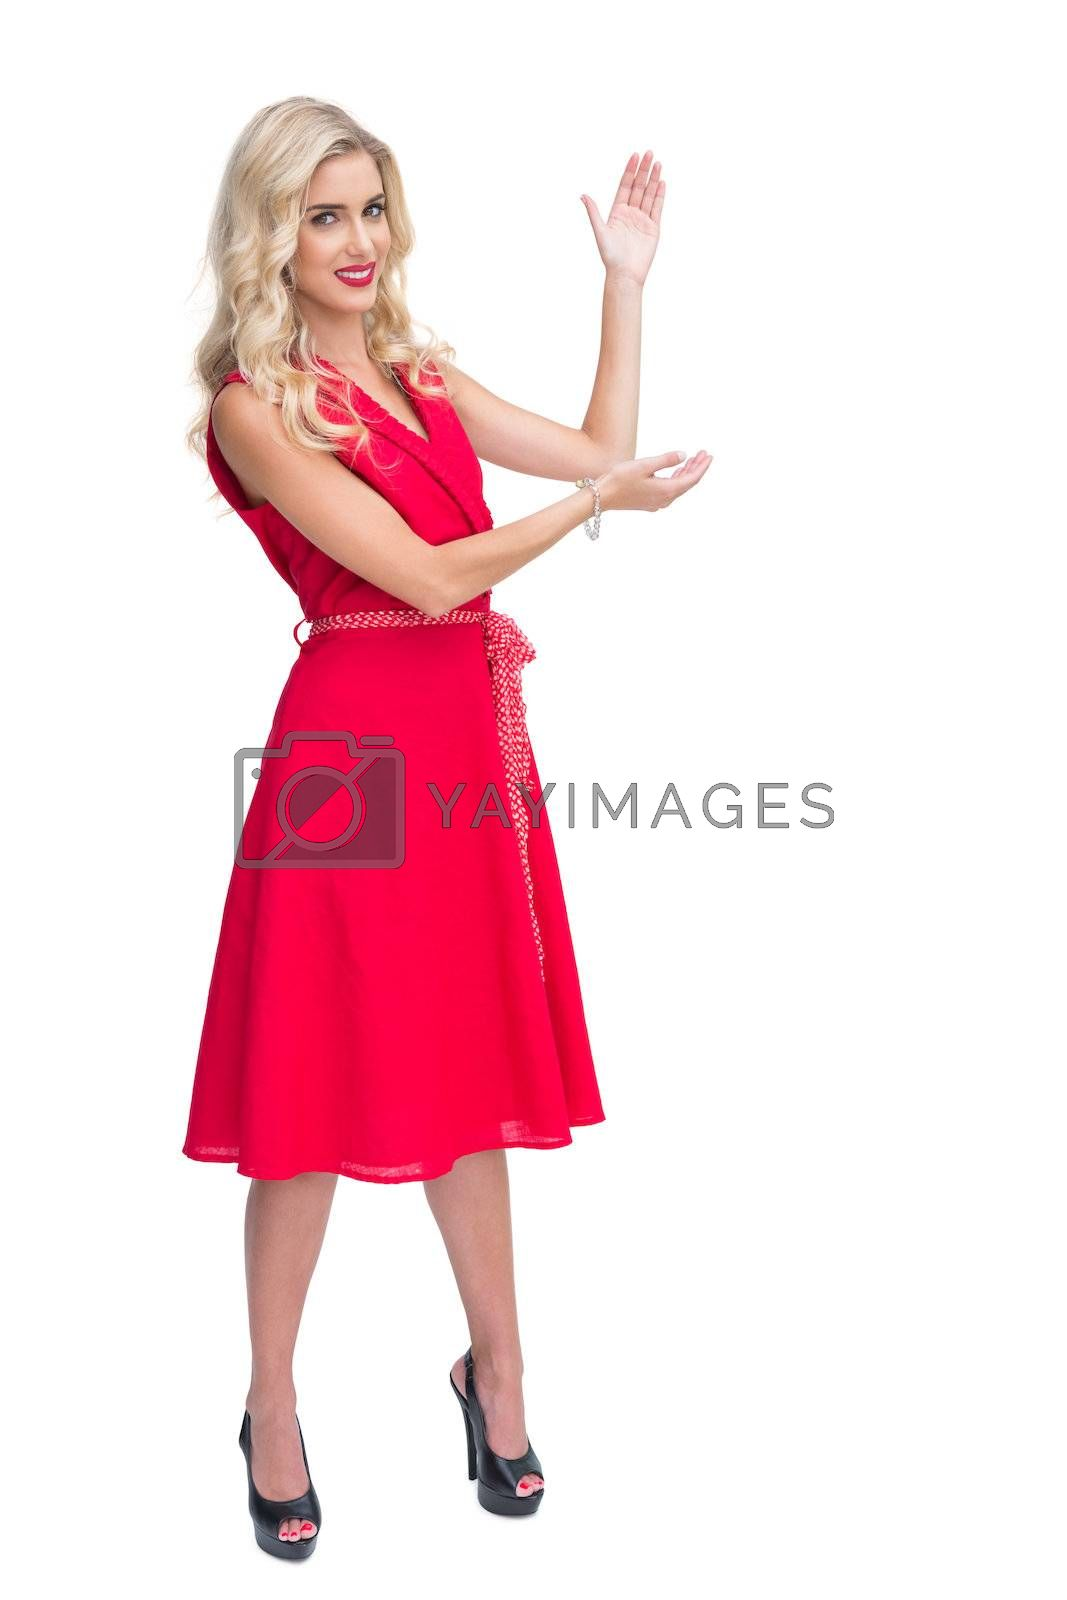 Woman wearing red dress presenting something by Wavebreakmedia